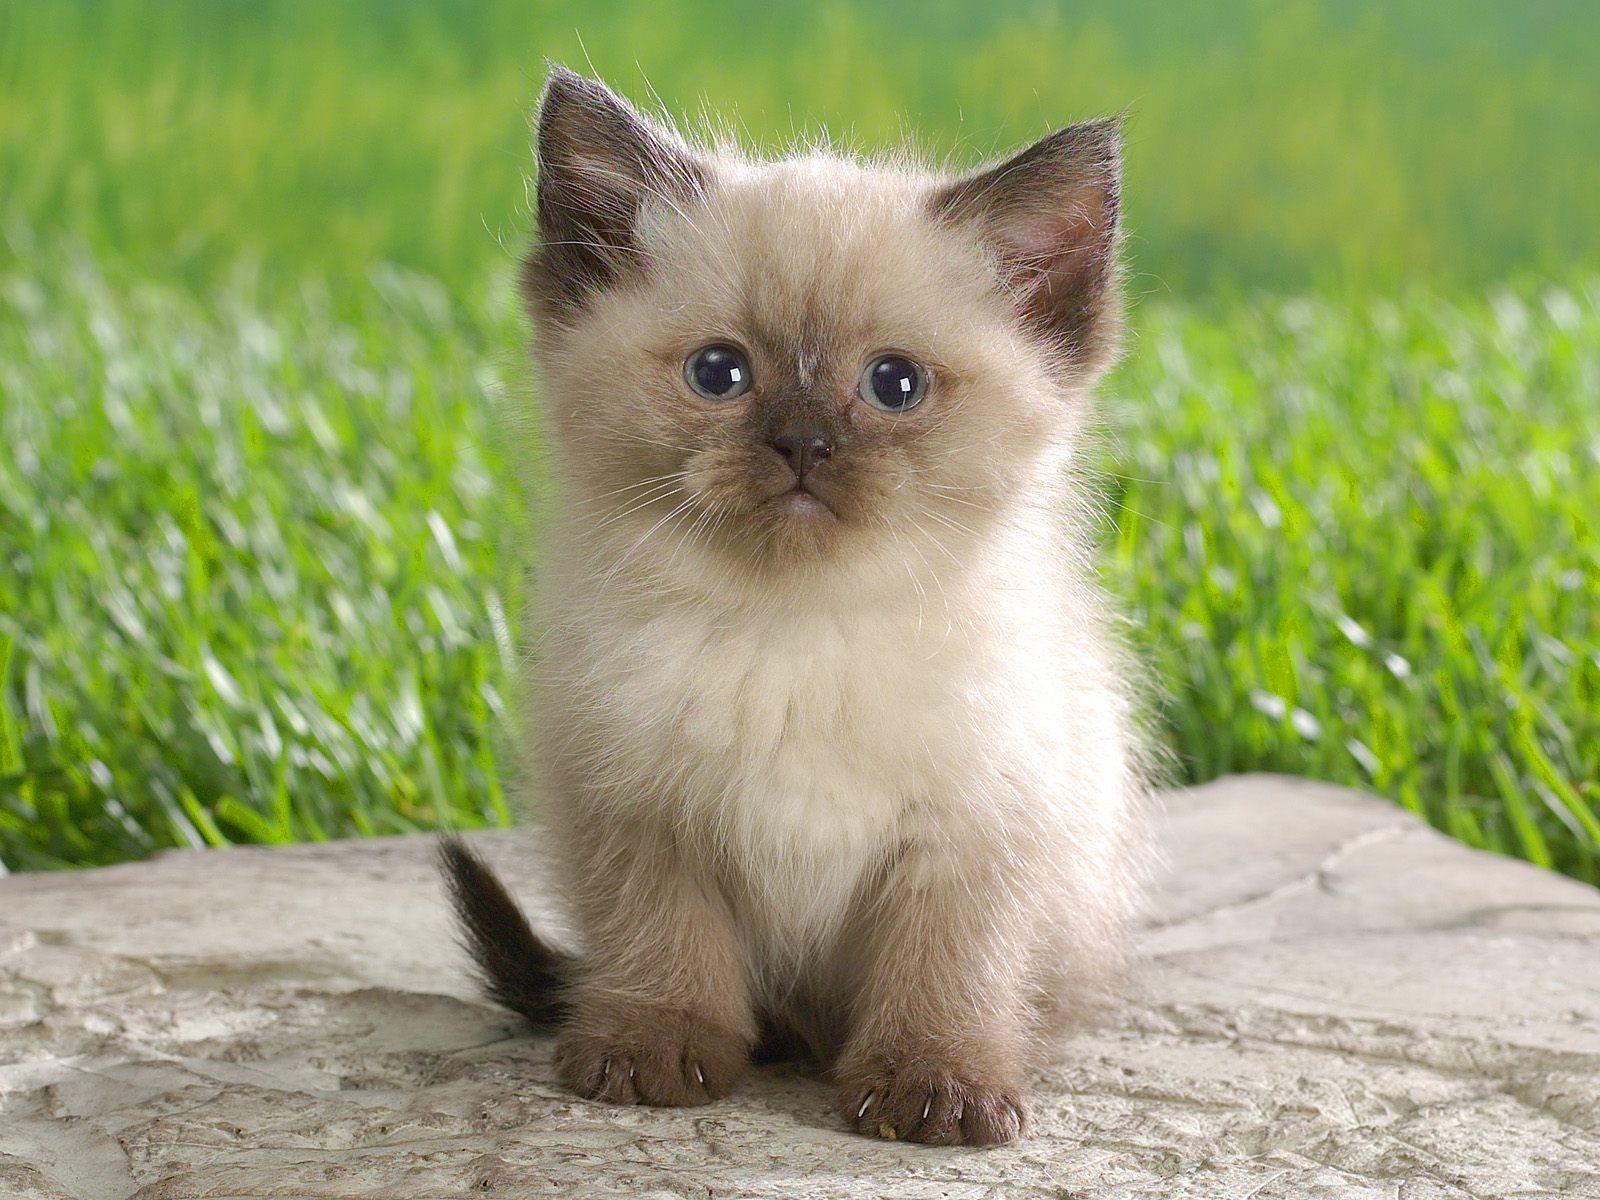 сейчас нижнем фото кумедного кошеняти манишки